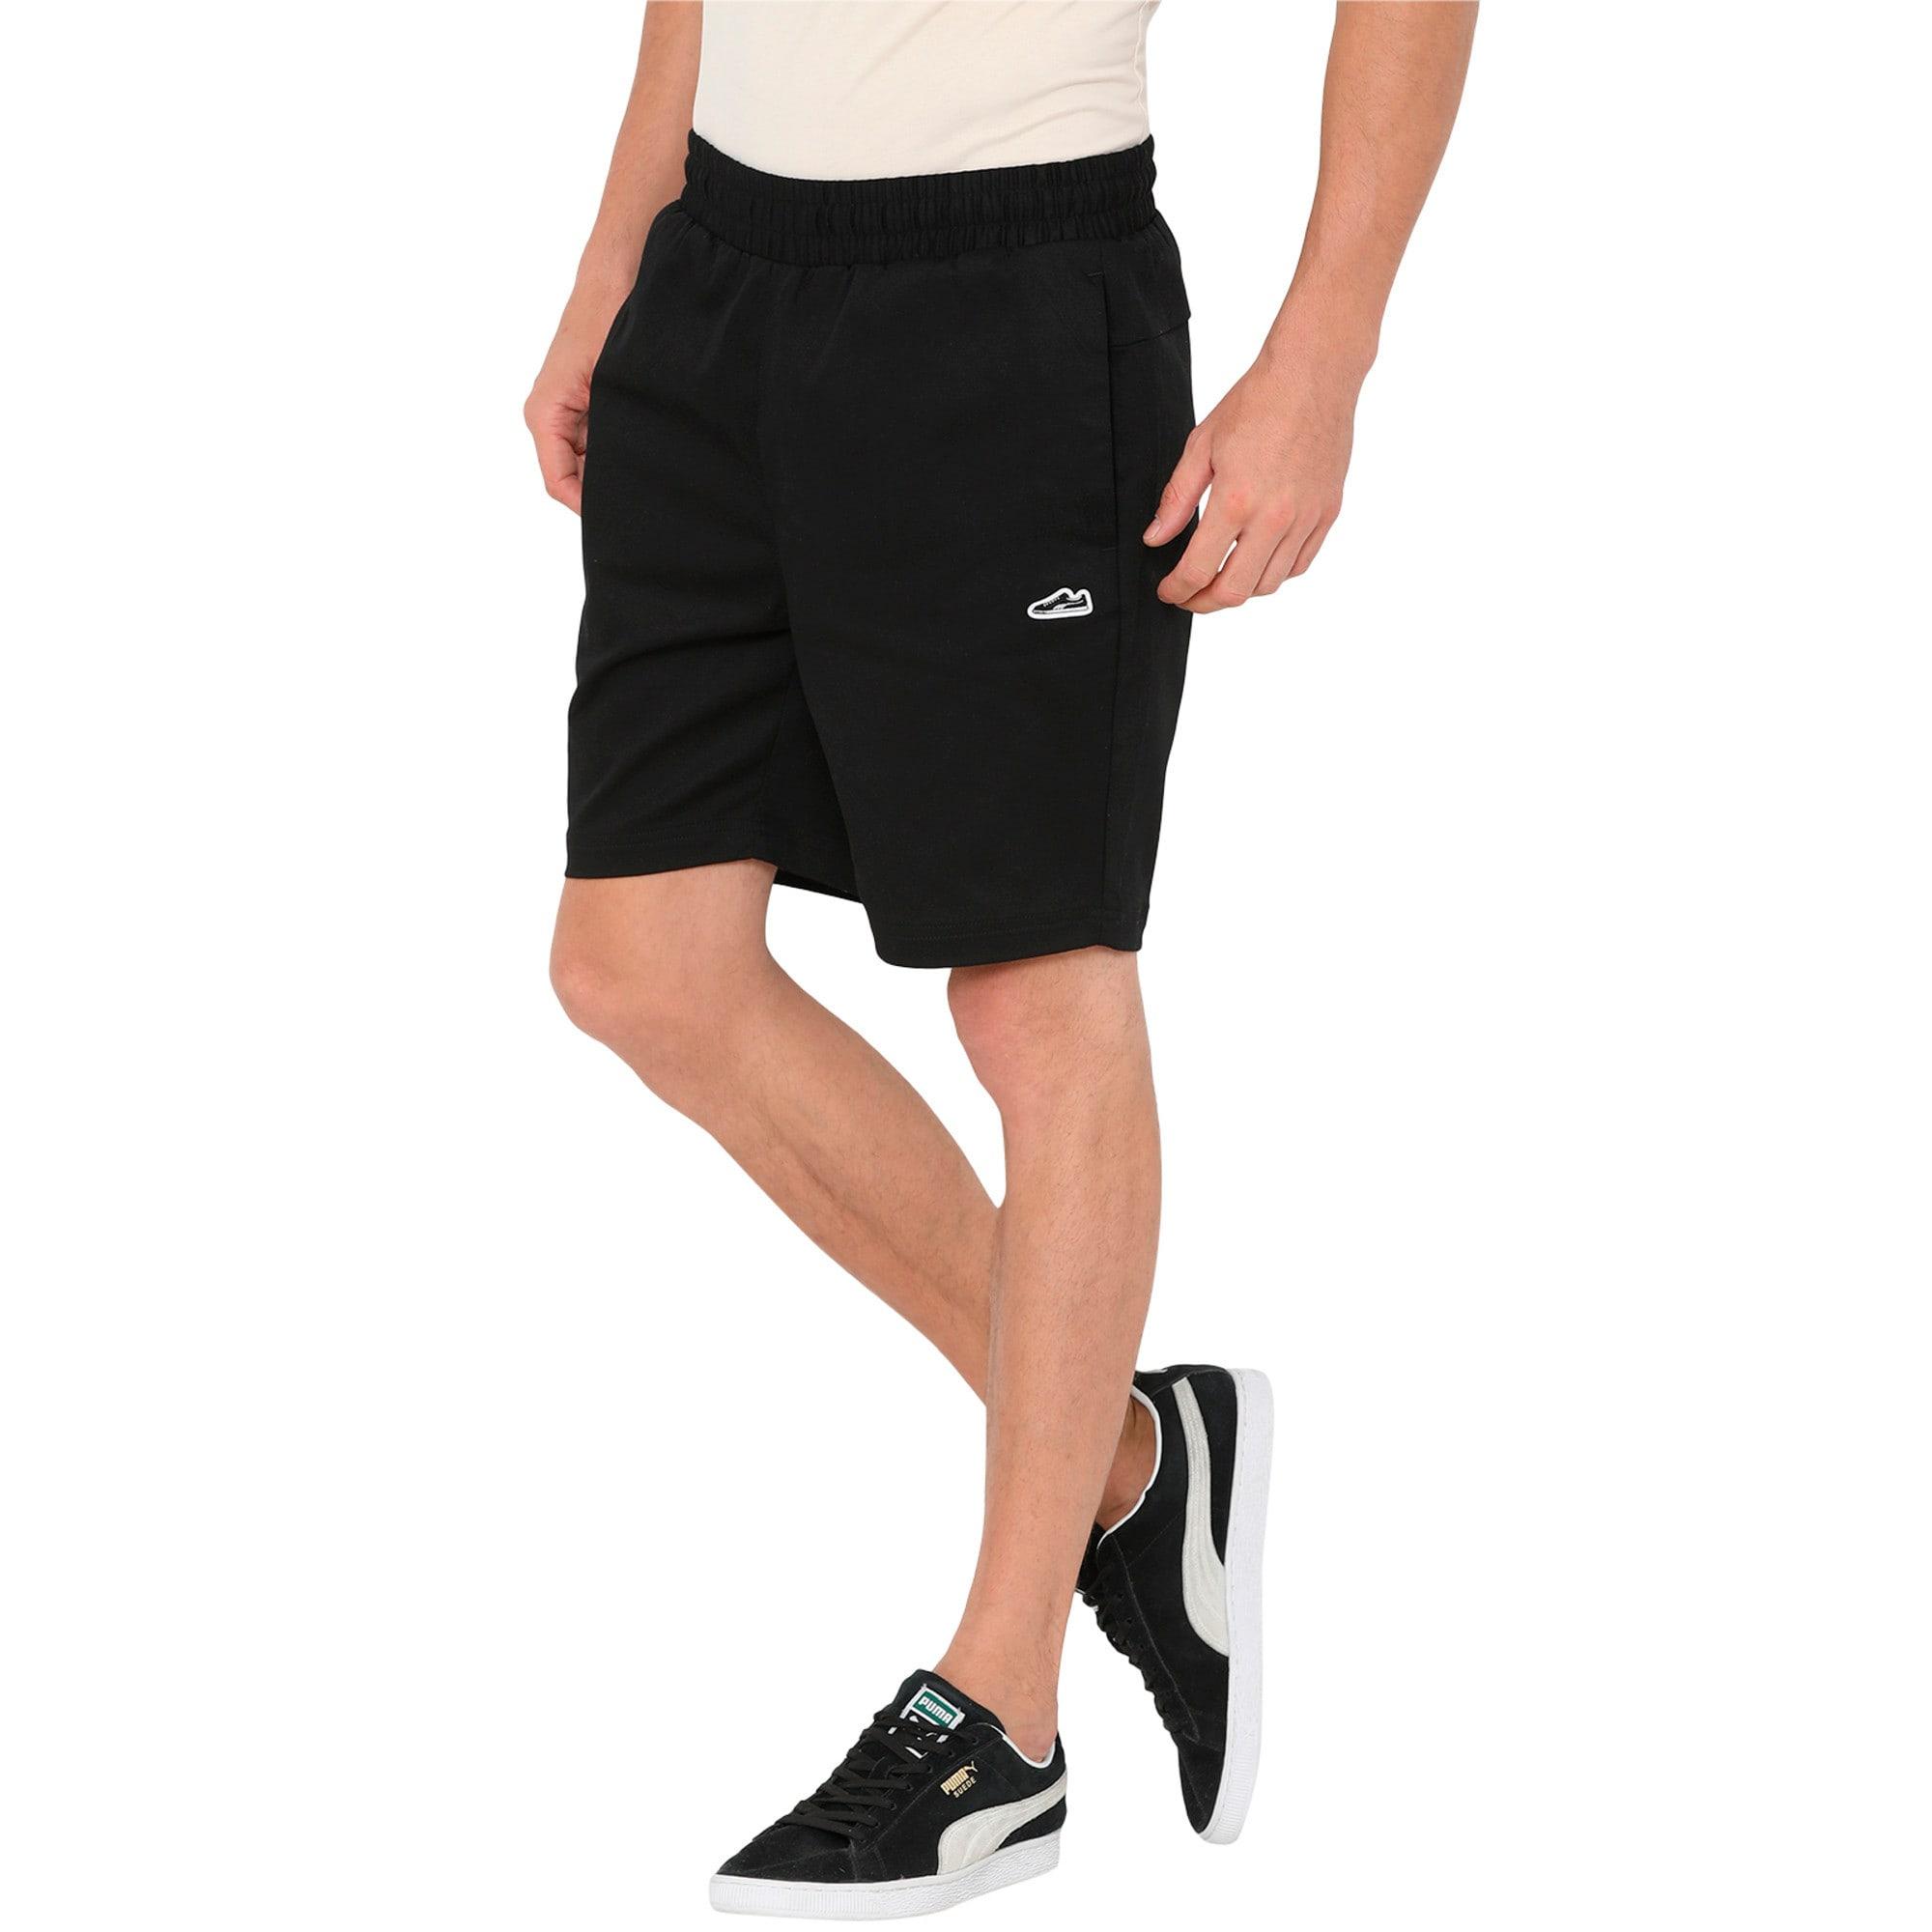 Thumbnail 5 of Men's Suede Shorts, Puma Black, medium-IND